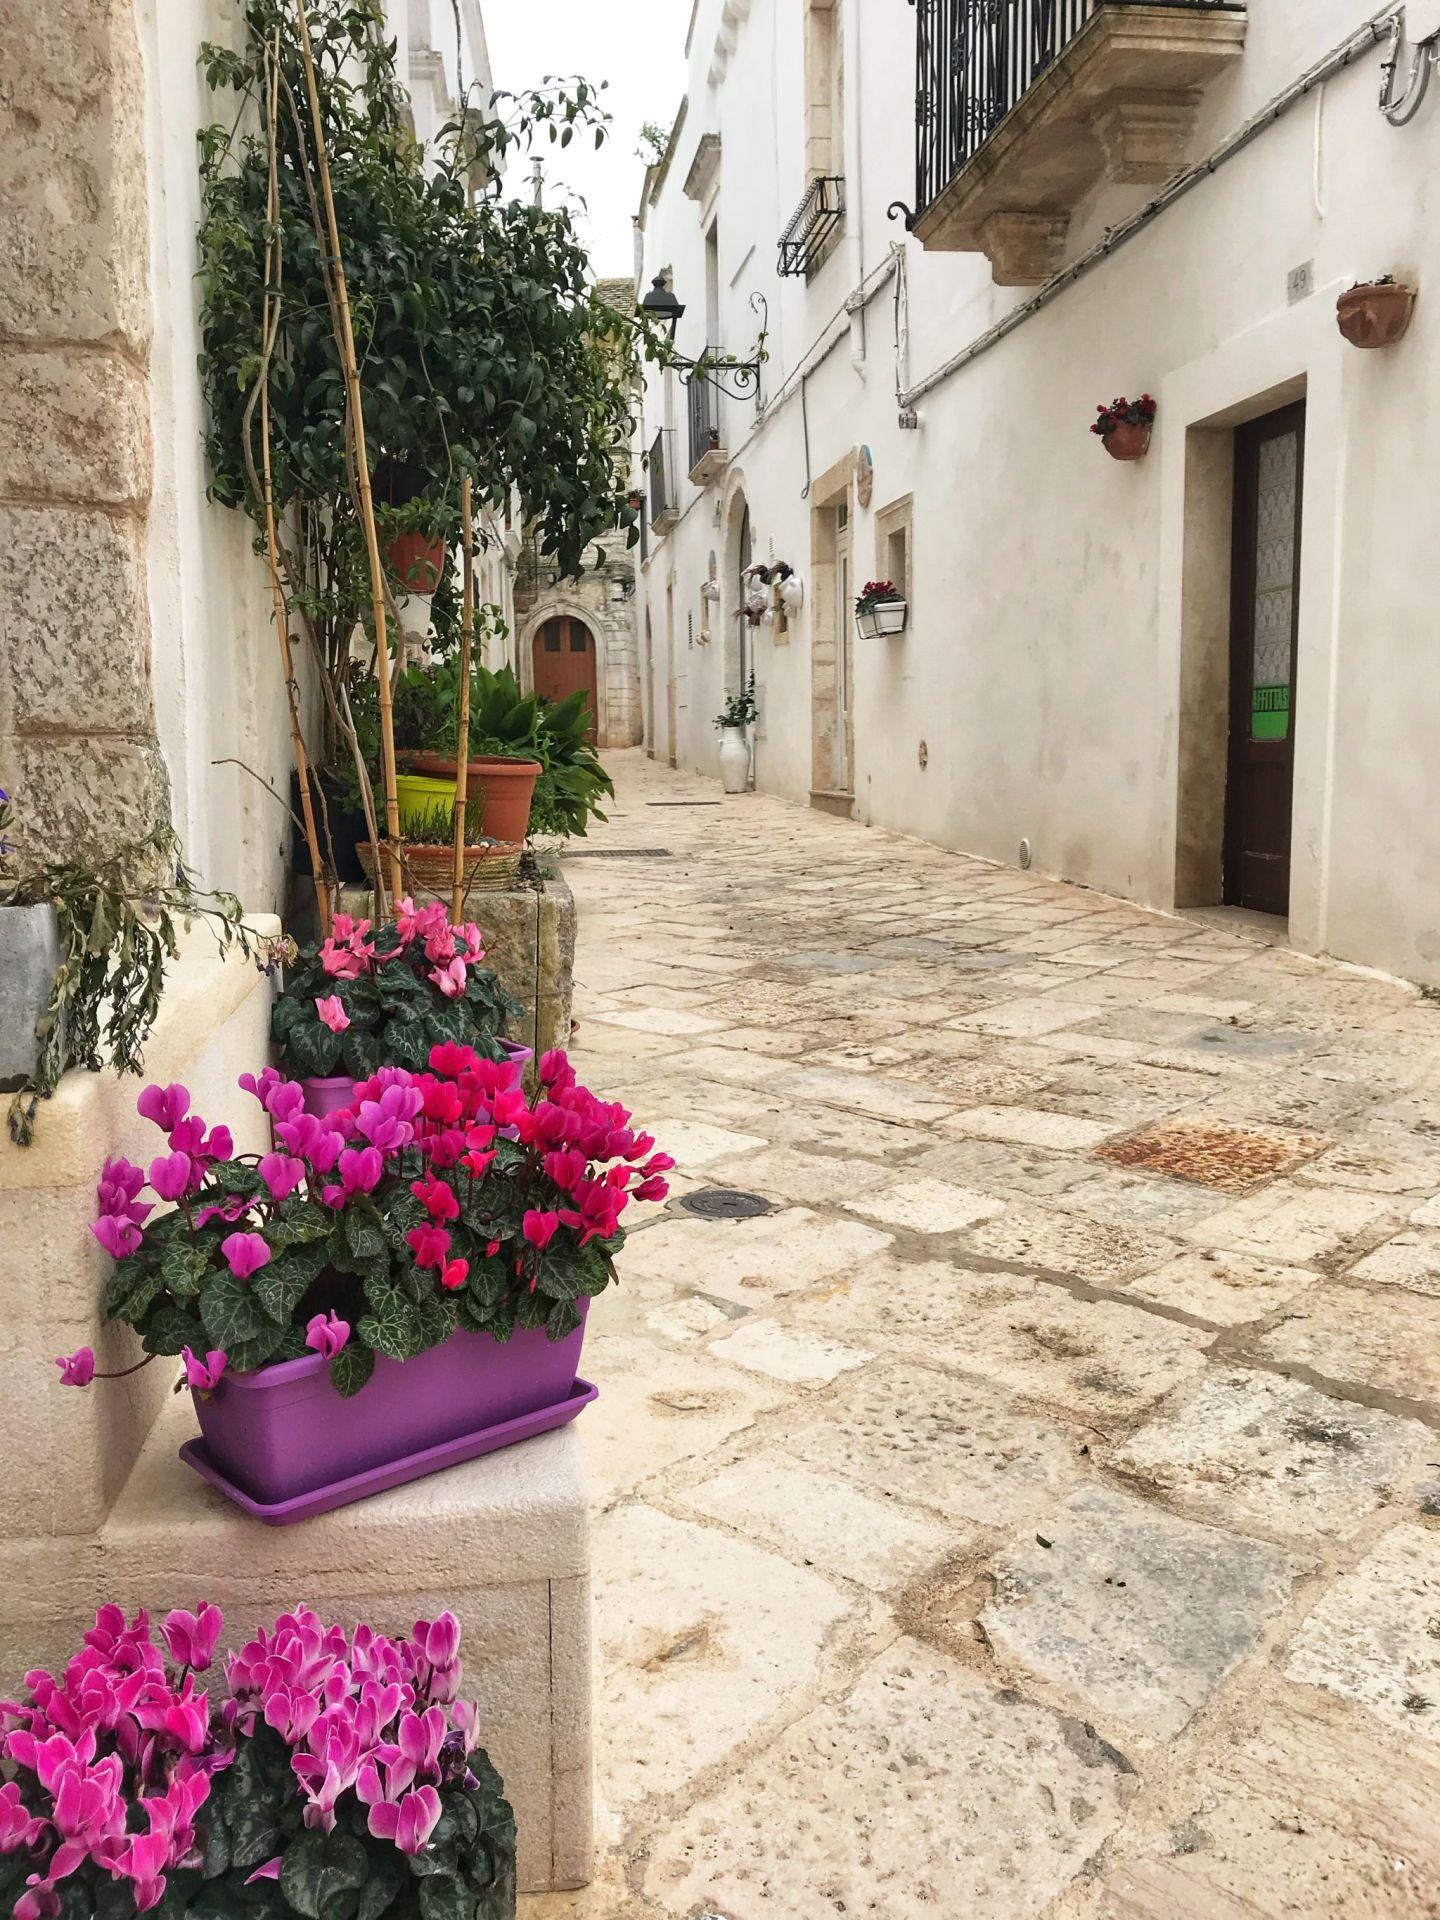 Flower lined streets of Locorotondo